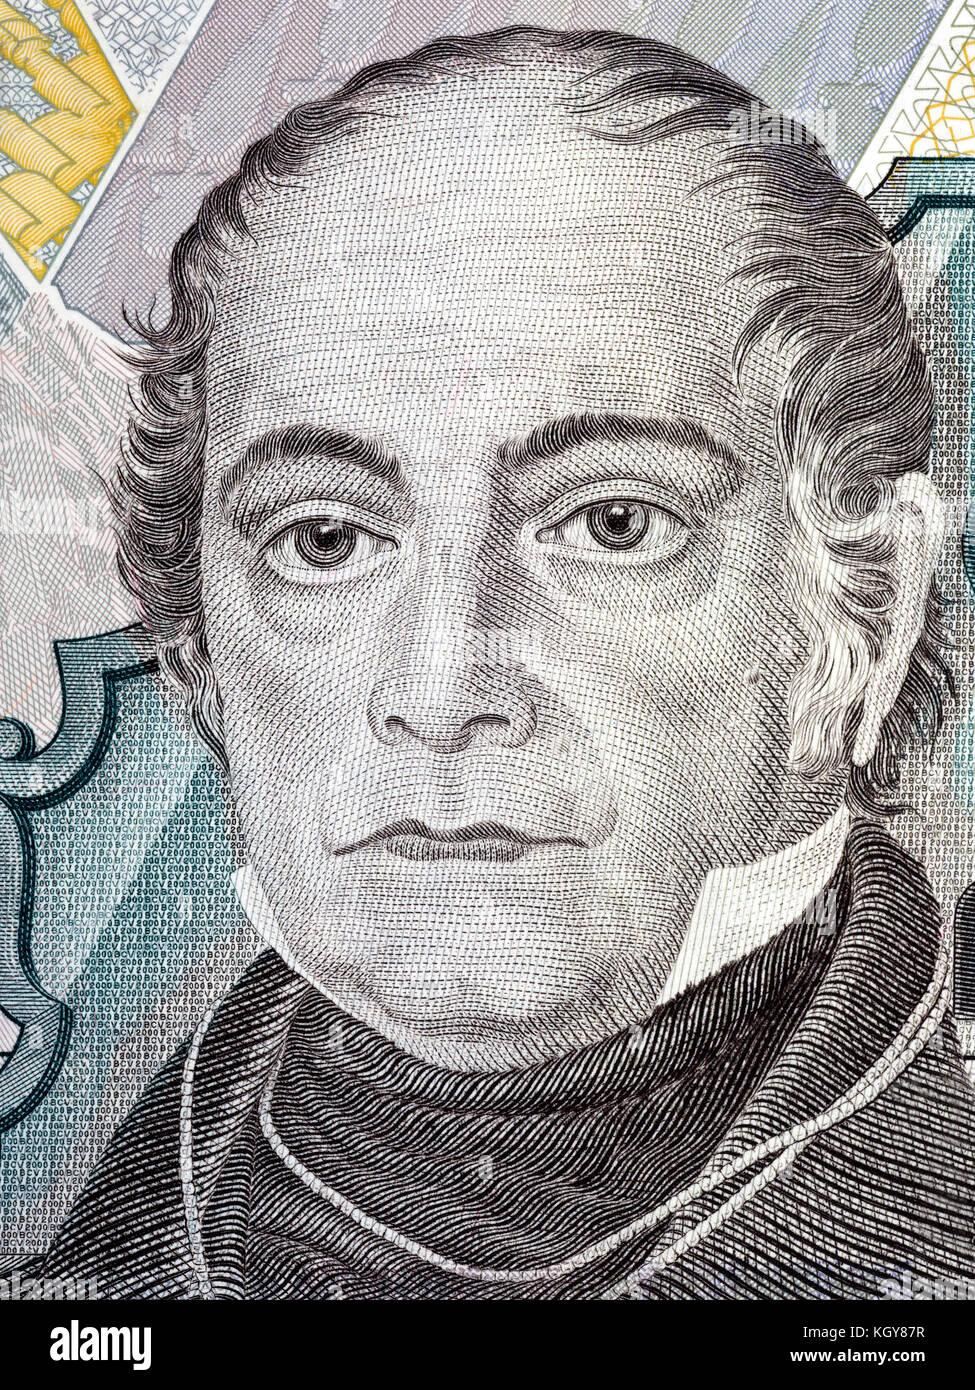 Andres Bello portrait from Venezuelan money - Stock Image